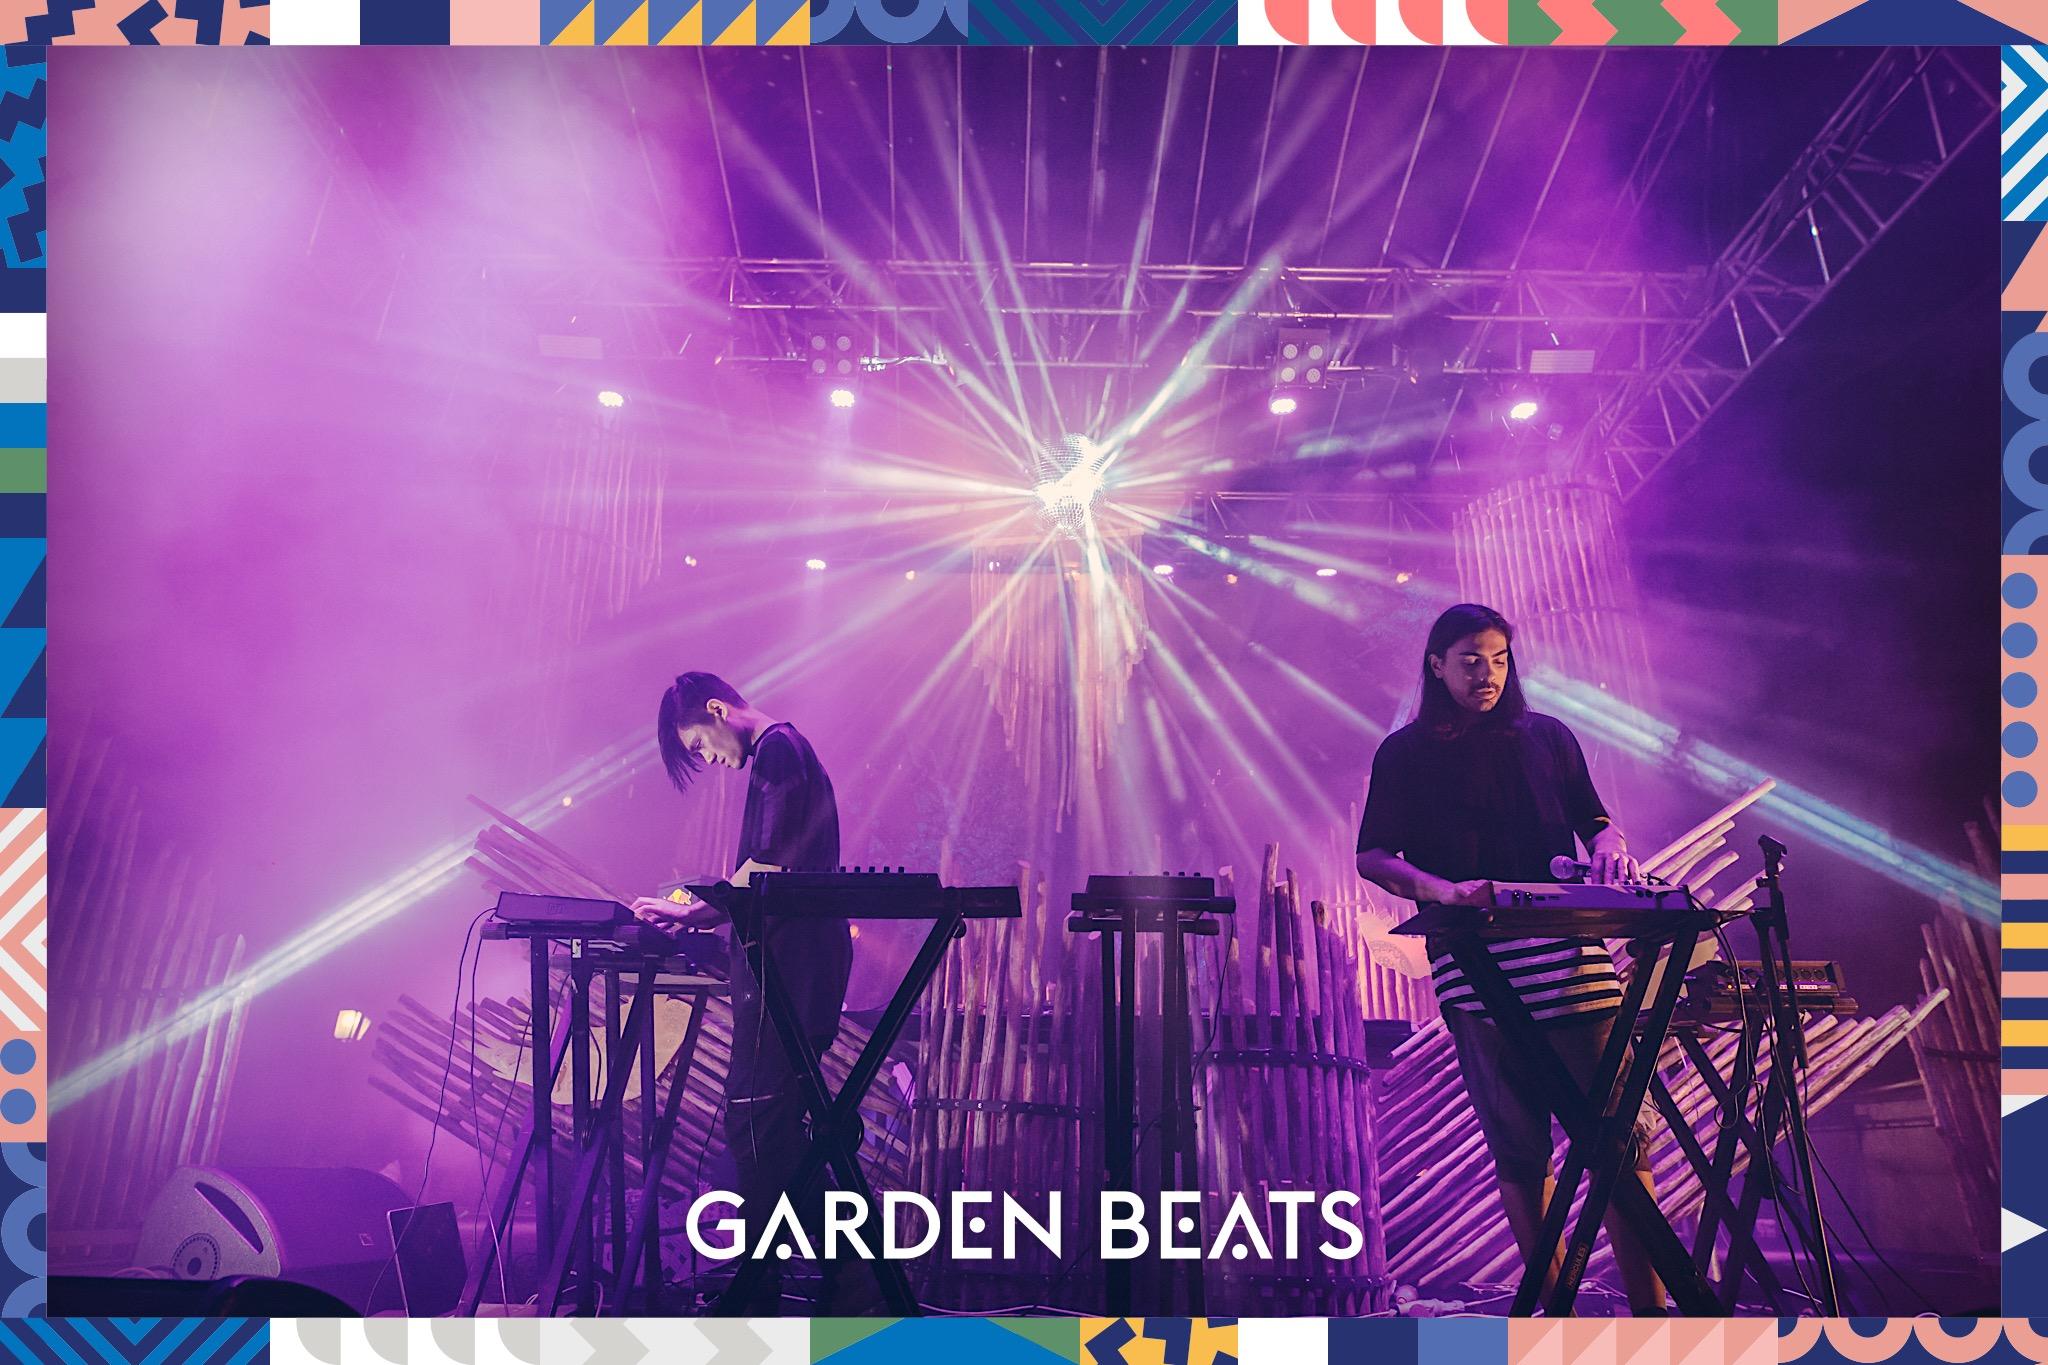 18032017_GardenBeats_Colossal725_WatermarkedGB.jpg